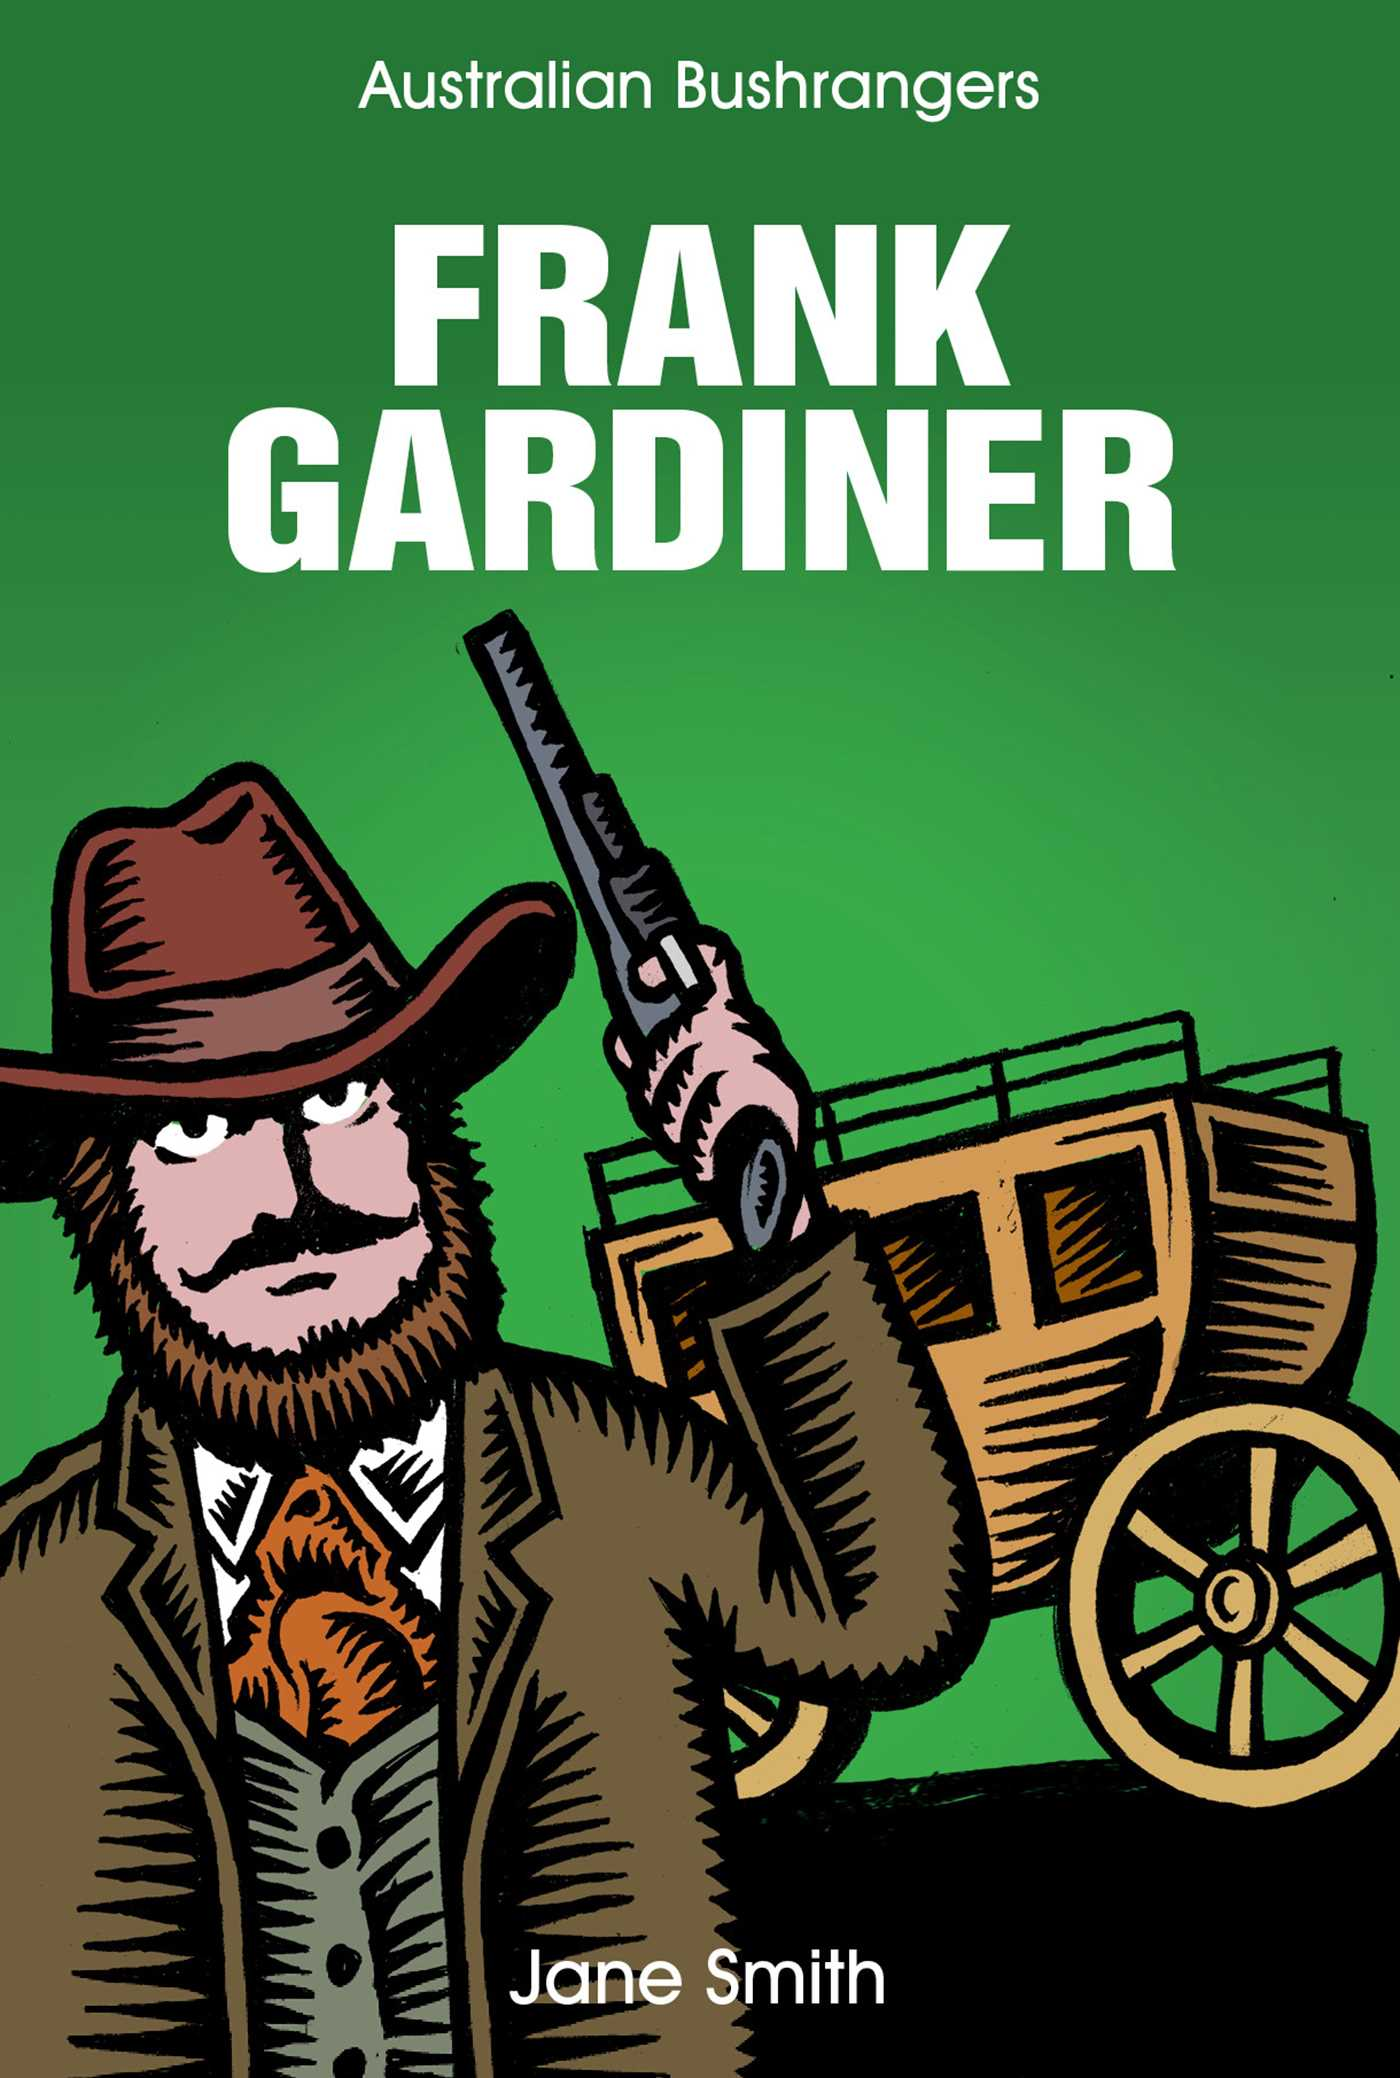 Picture of Frank Gardiner